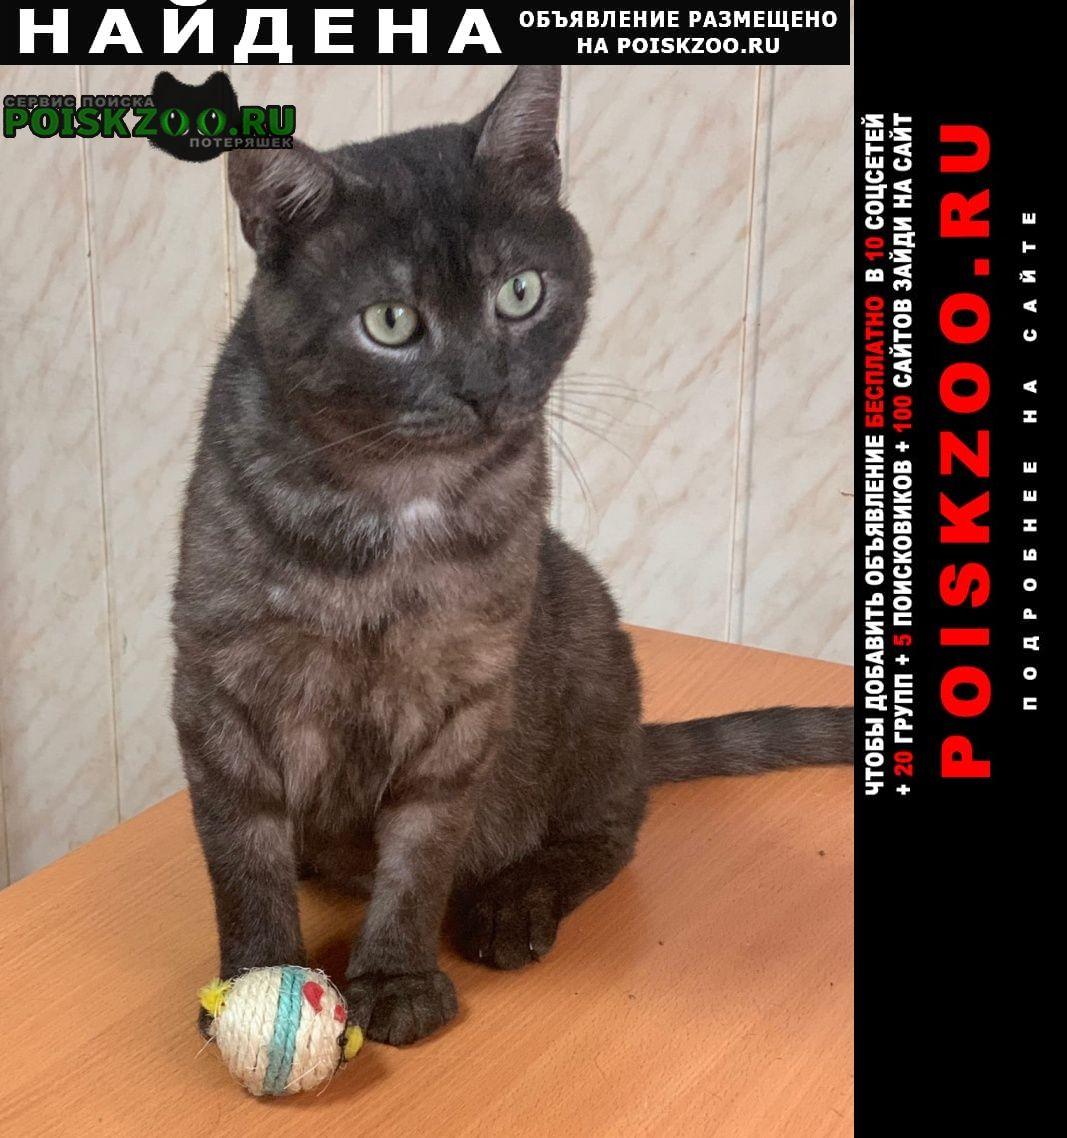 Найден кот Орехово-Зуево